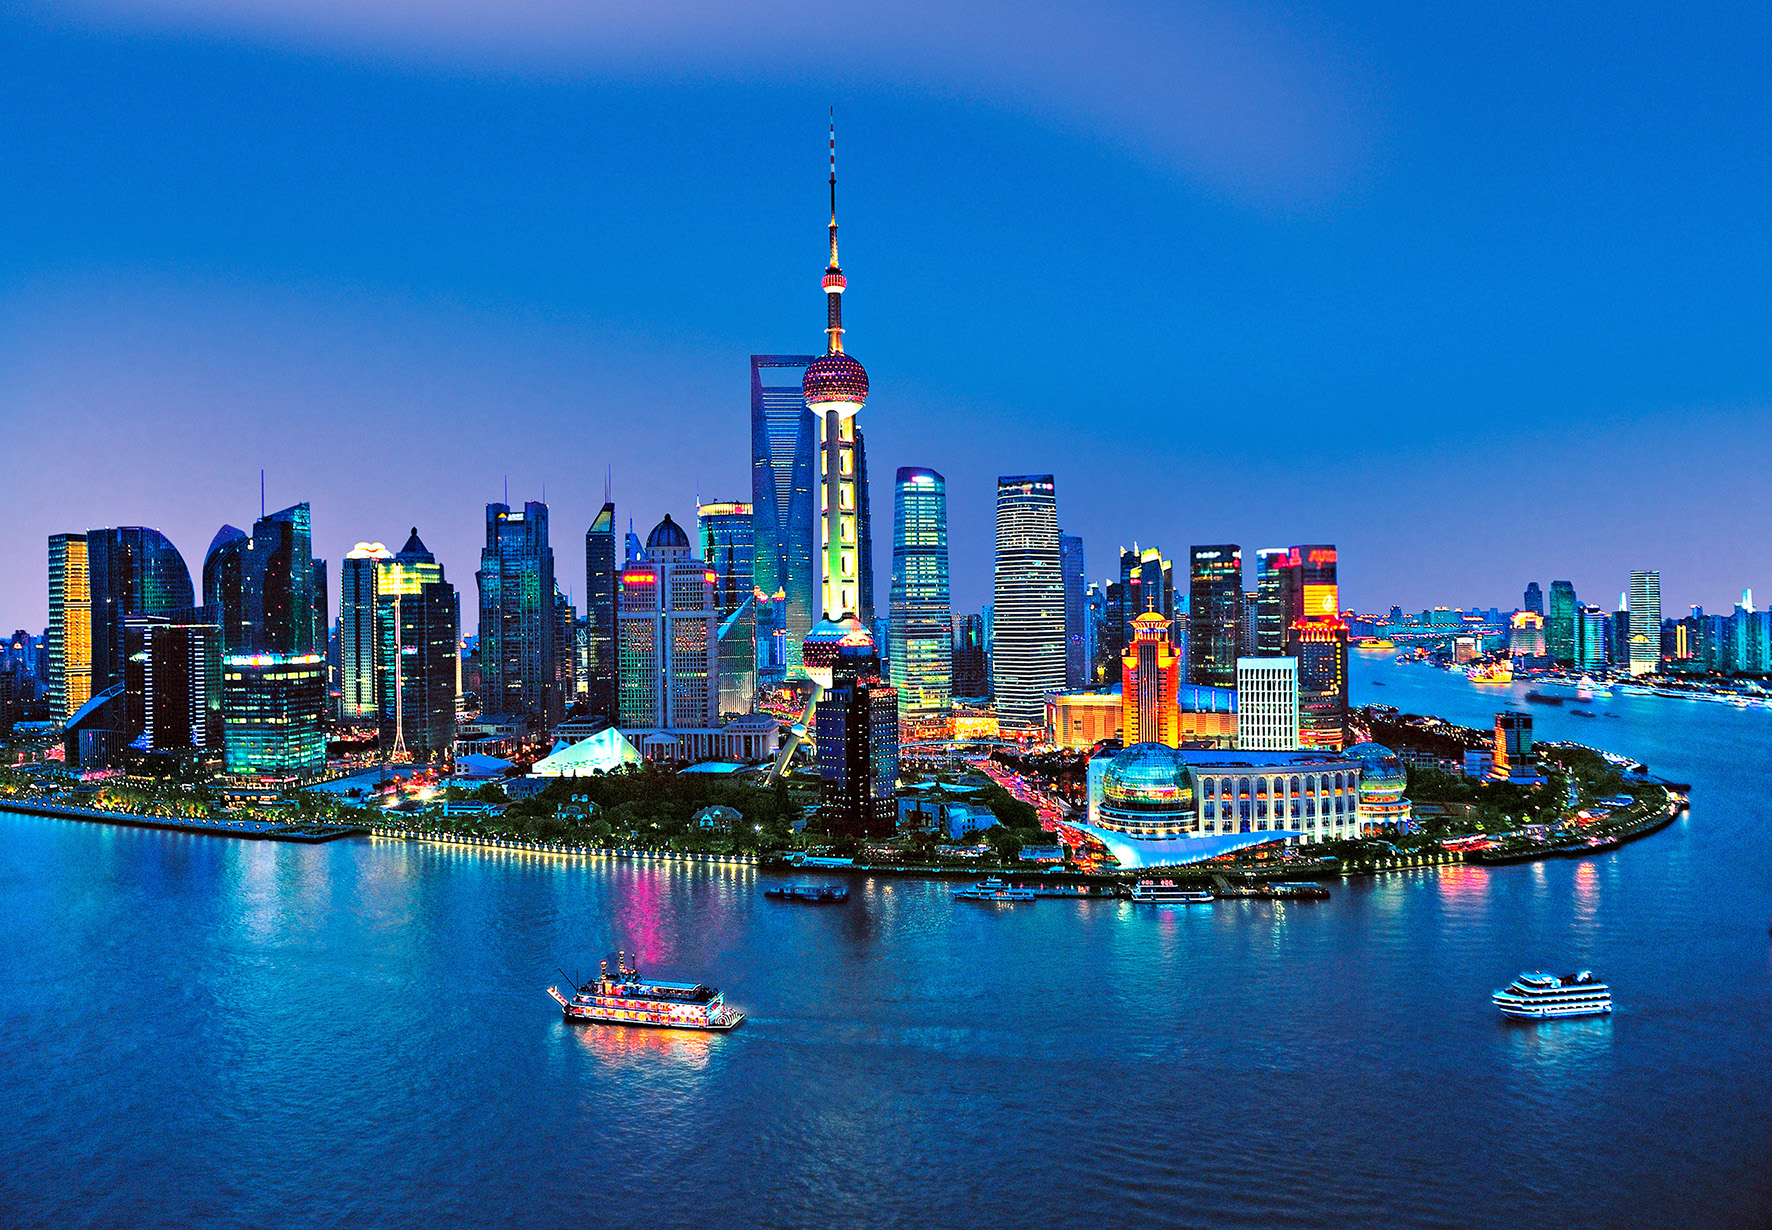 fototapete shanghai skyline 366x254 abendlicher blick auf pudong china asien ebay. Black Bedroom Furniture Sets. Home Design Ideas